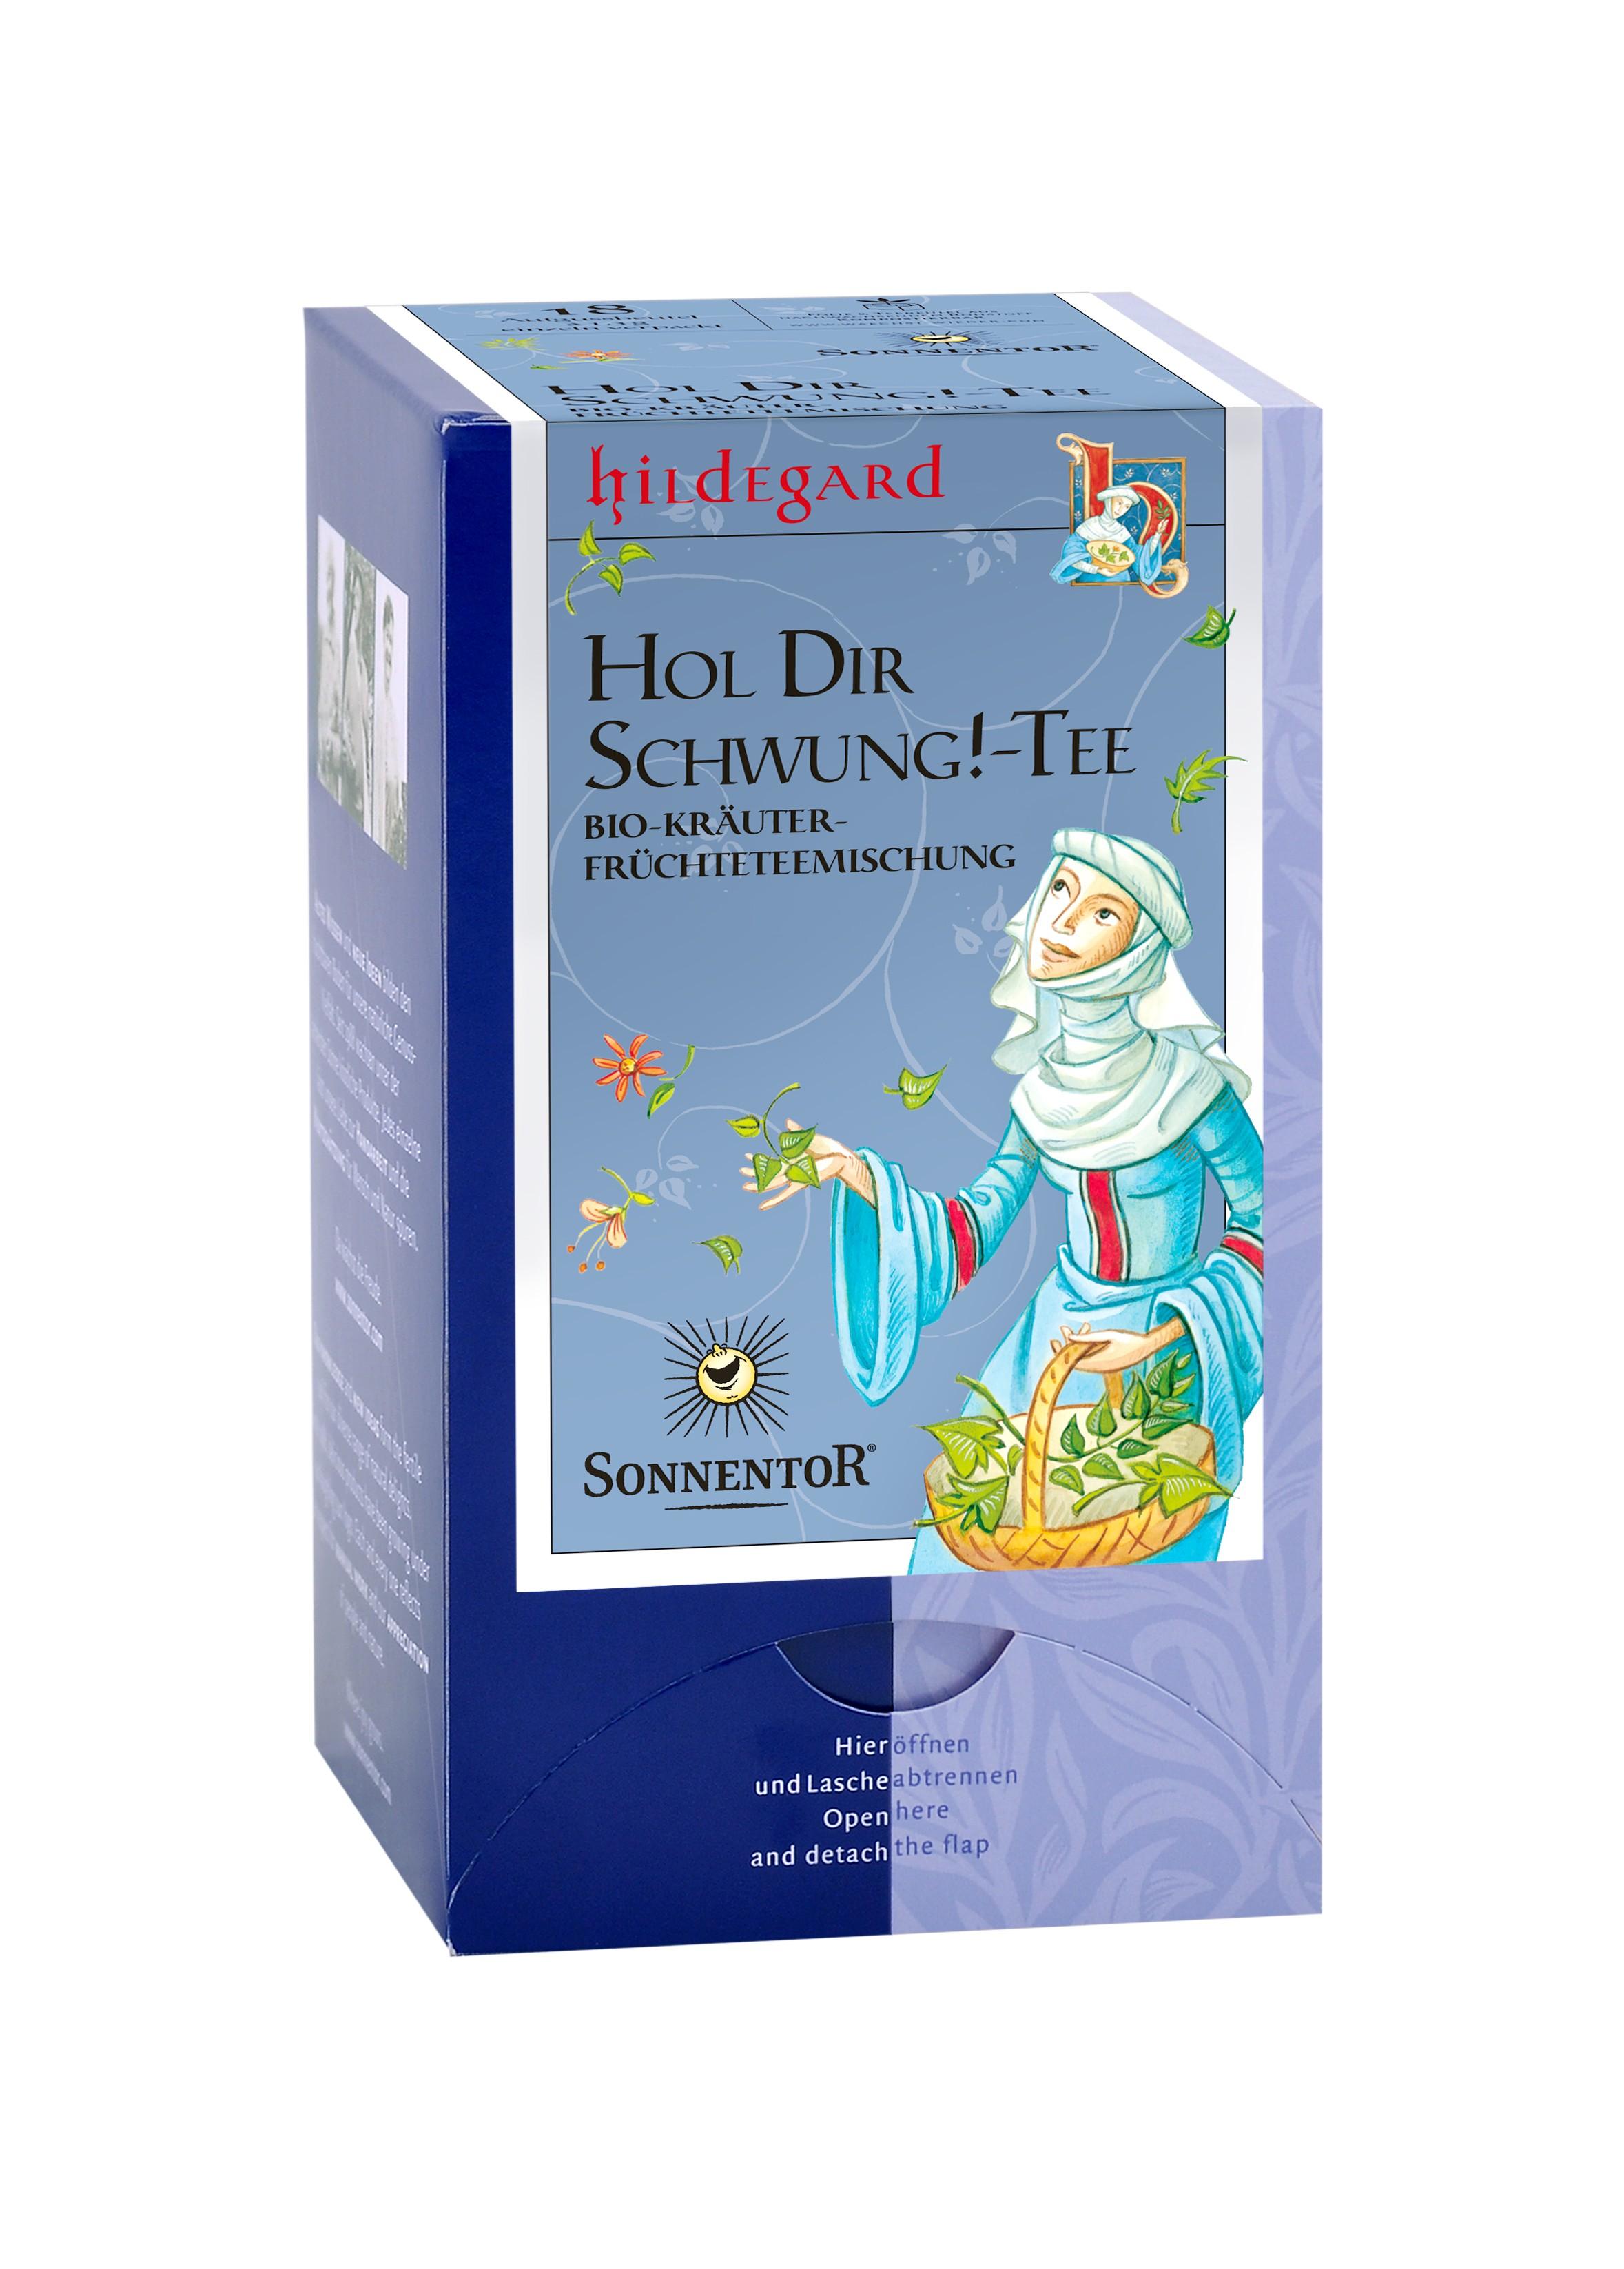 Hol Dir Schwung! Tee Hildegard bio